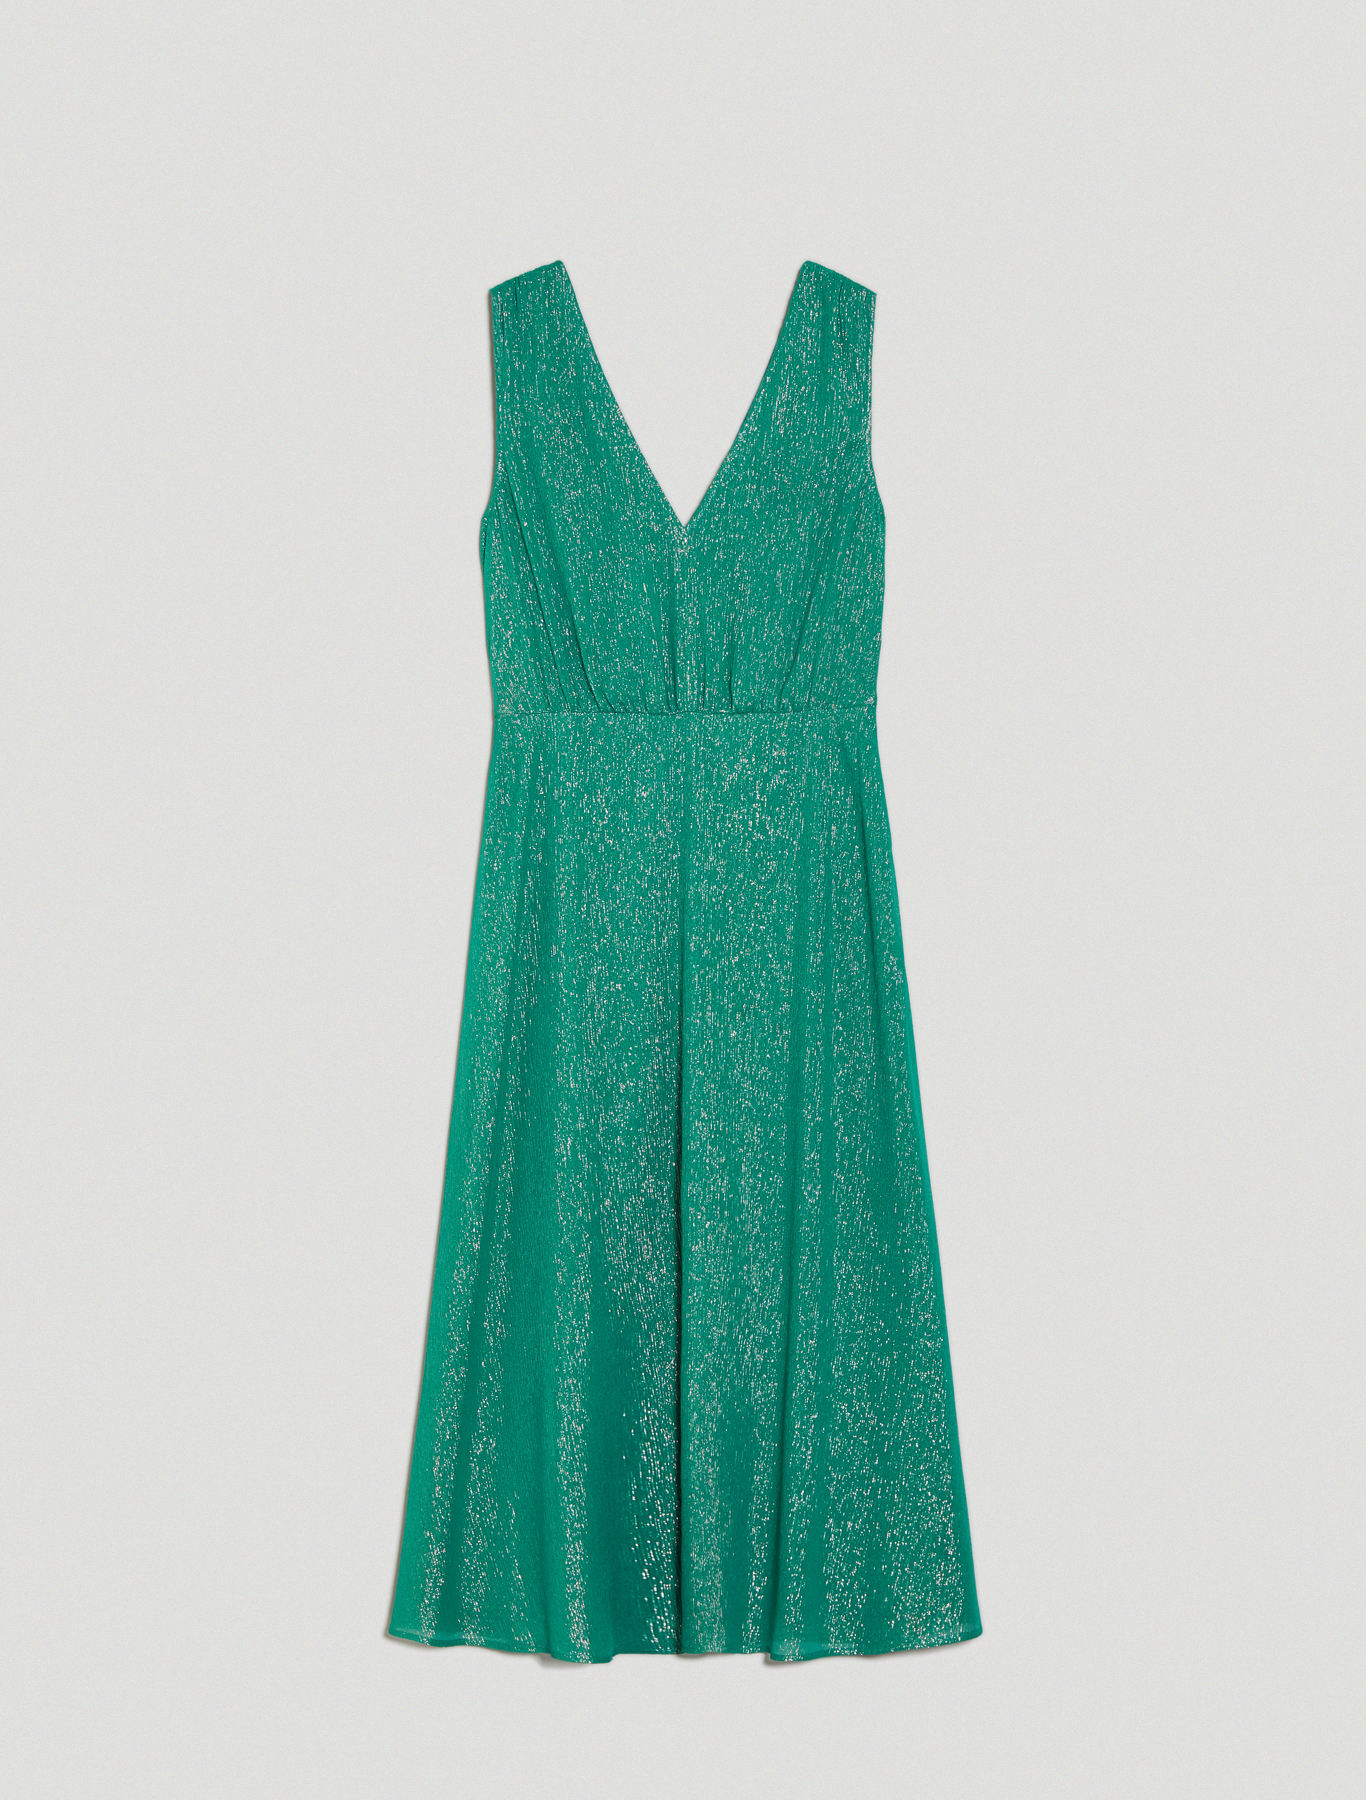 Lamé silk midi dress - green pattern - pennyblack